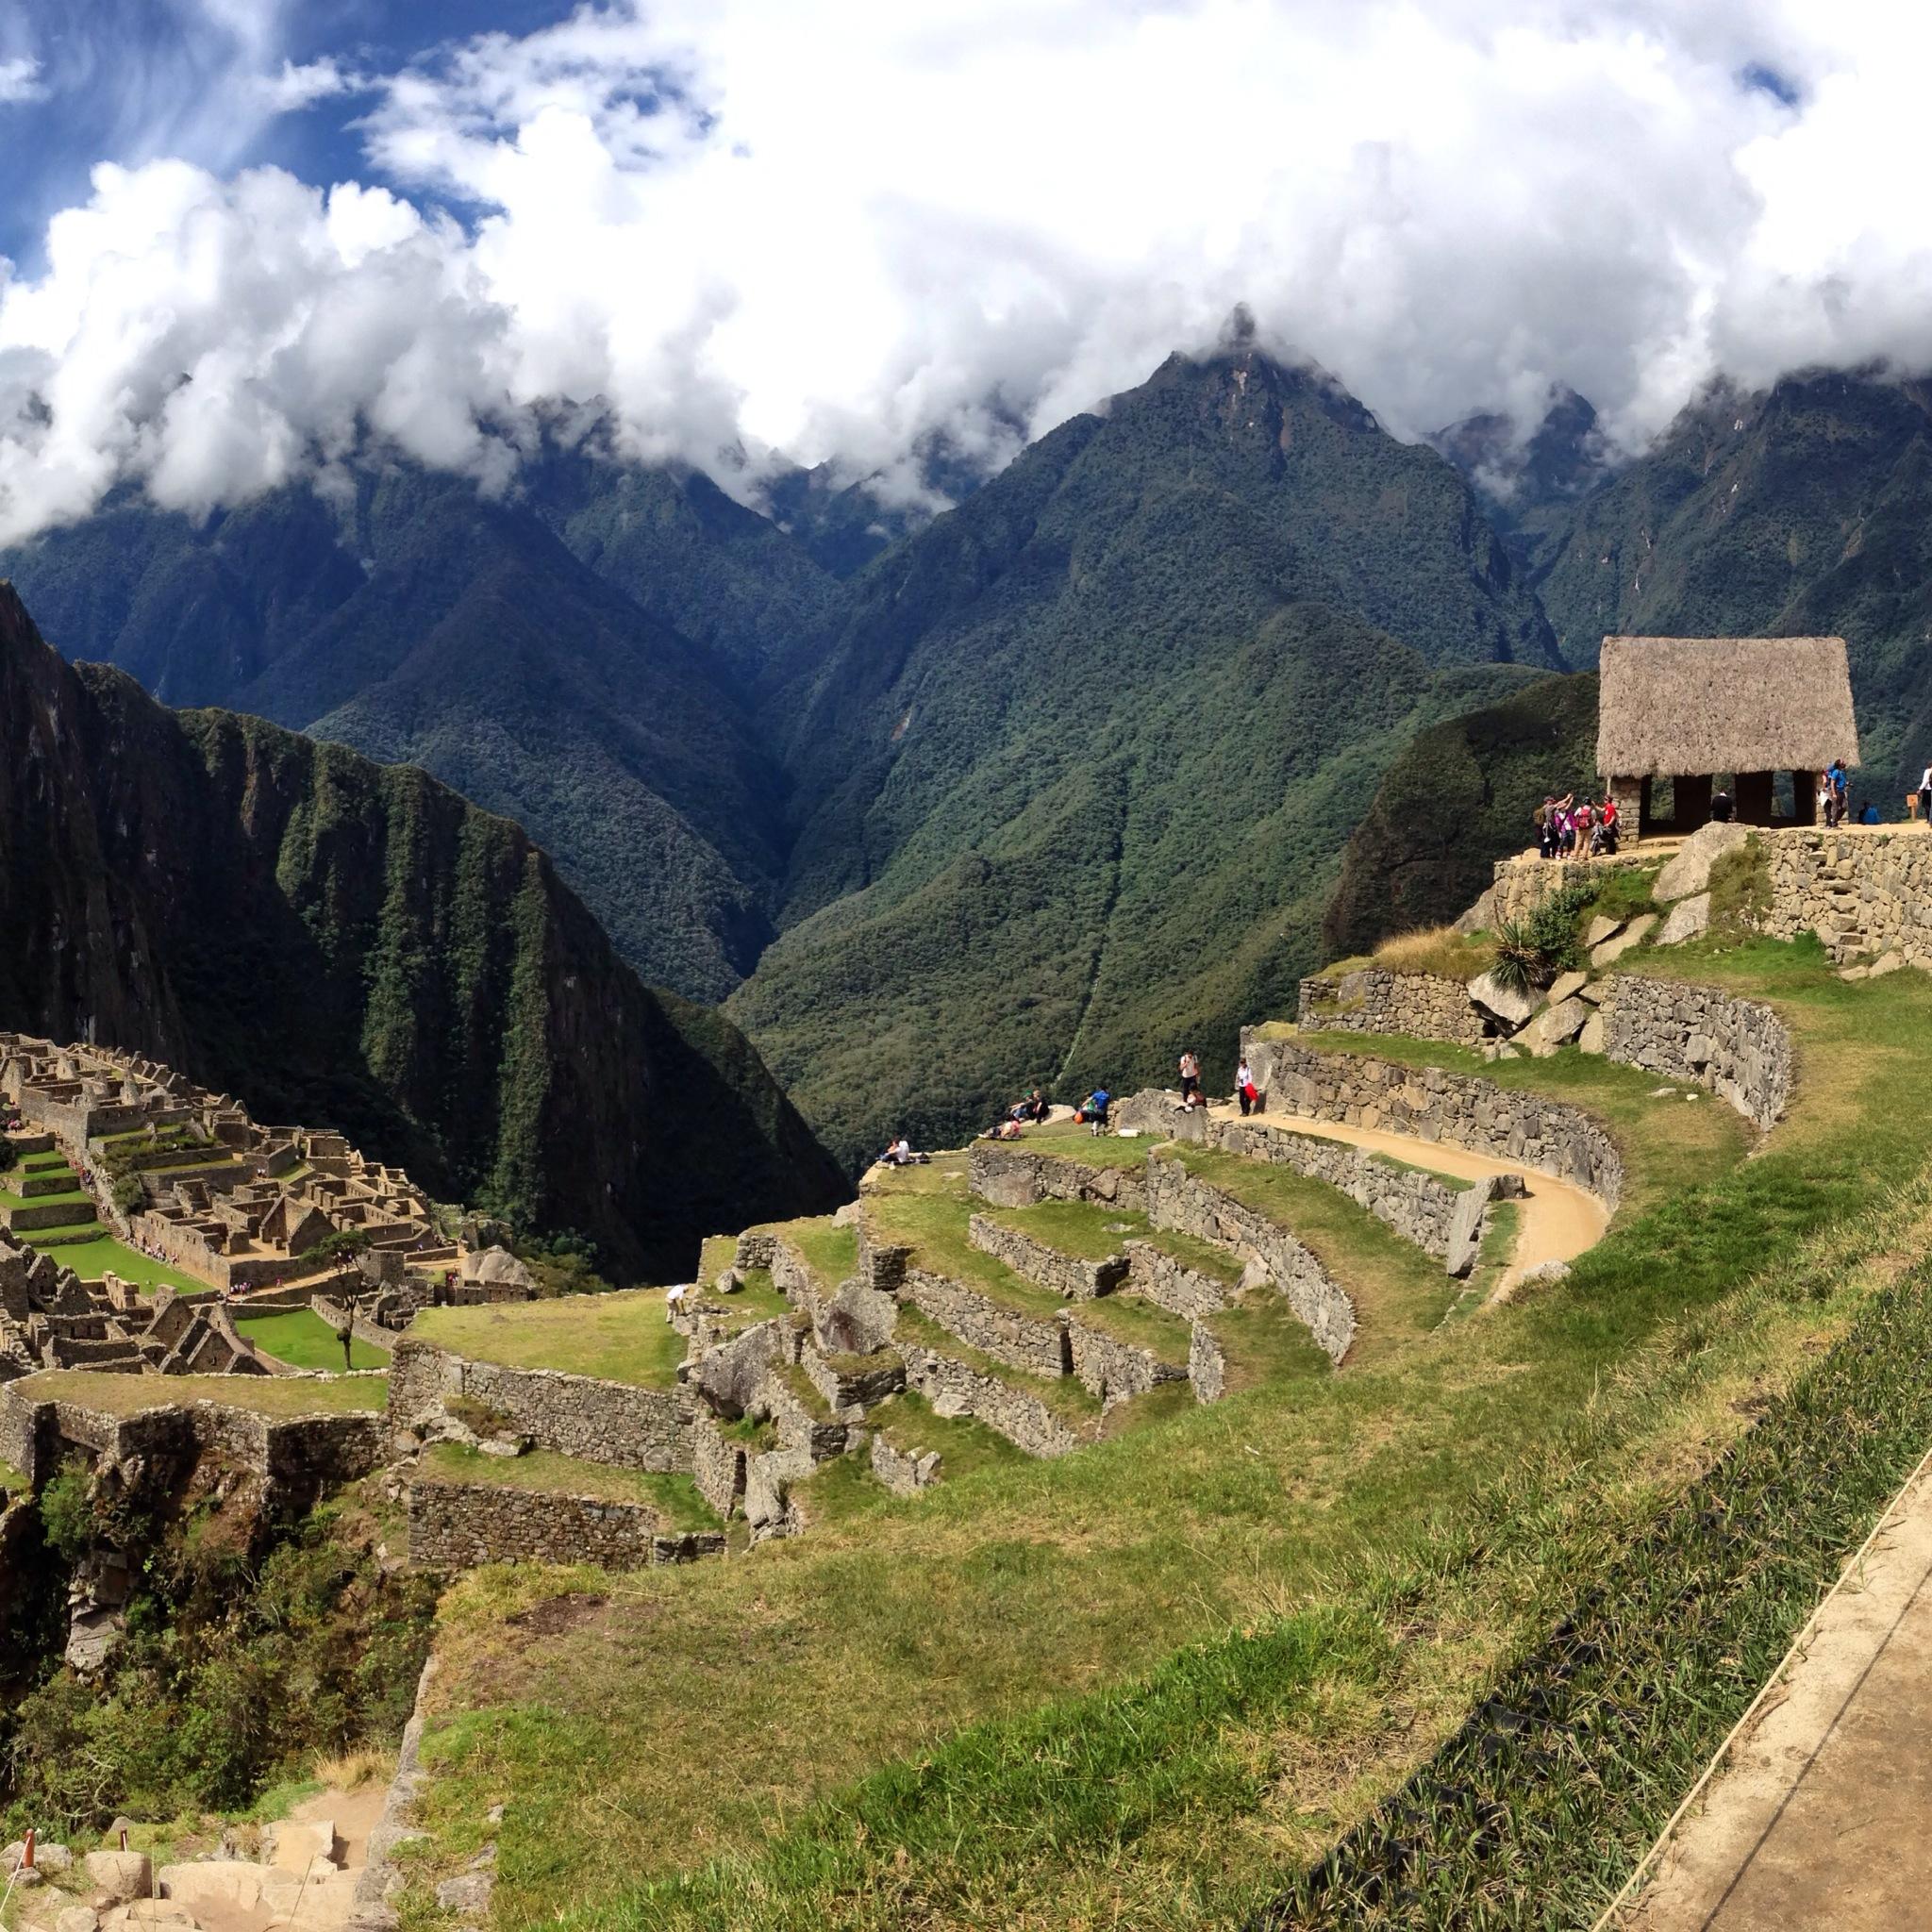 Machu Picchu Excitedeye S Blog